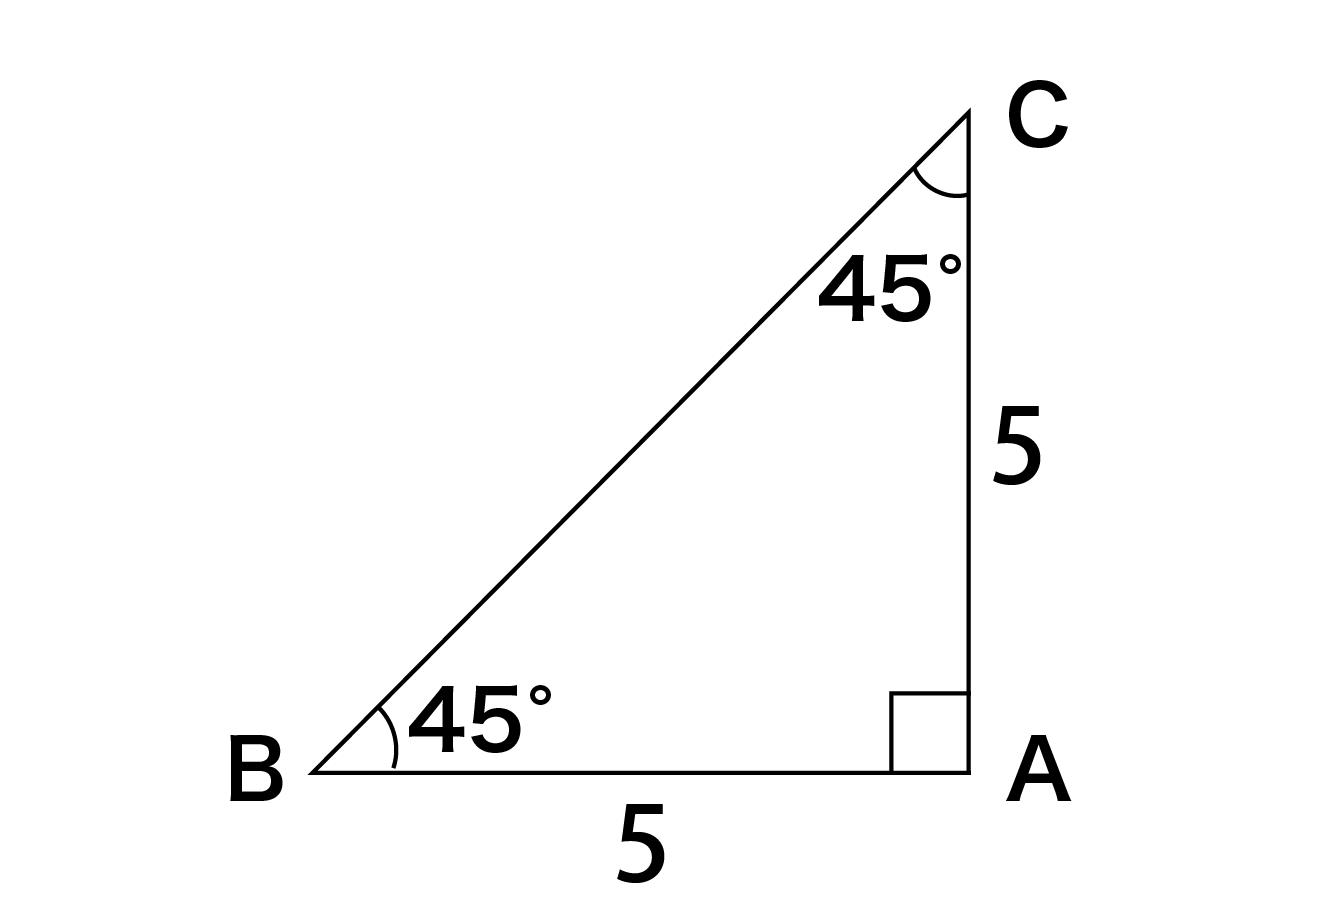 AB=AC=5の直角二等辺三角形